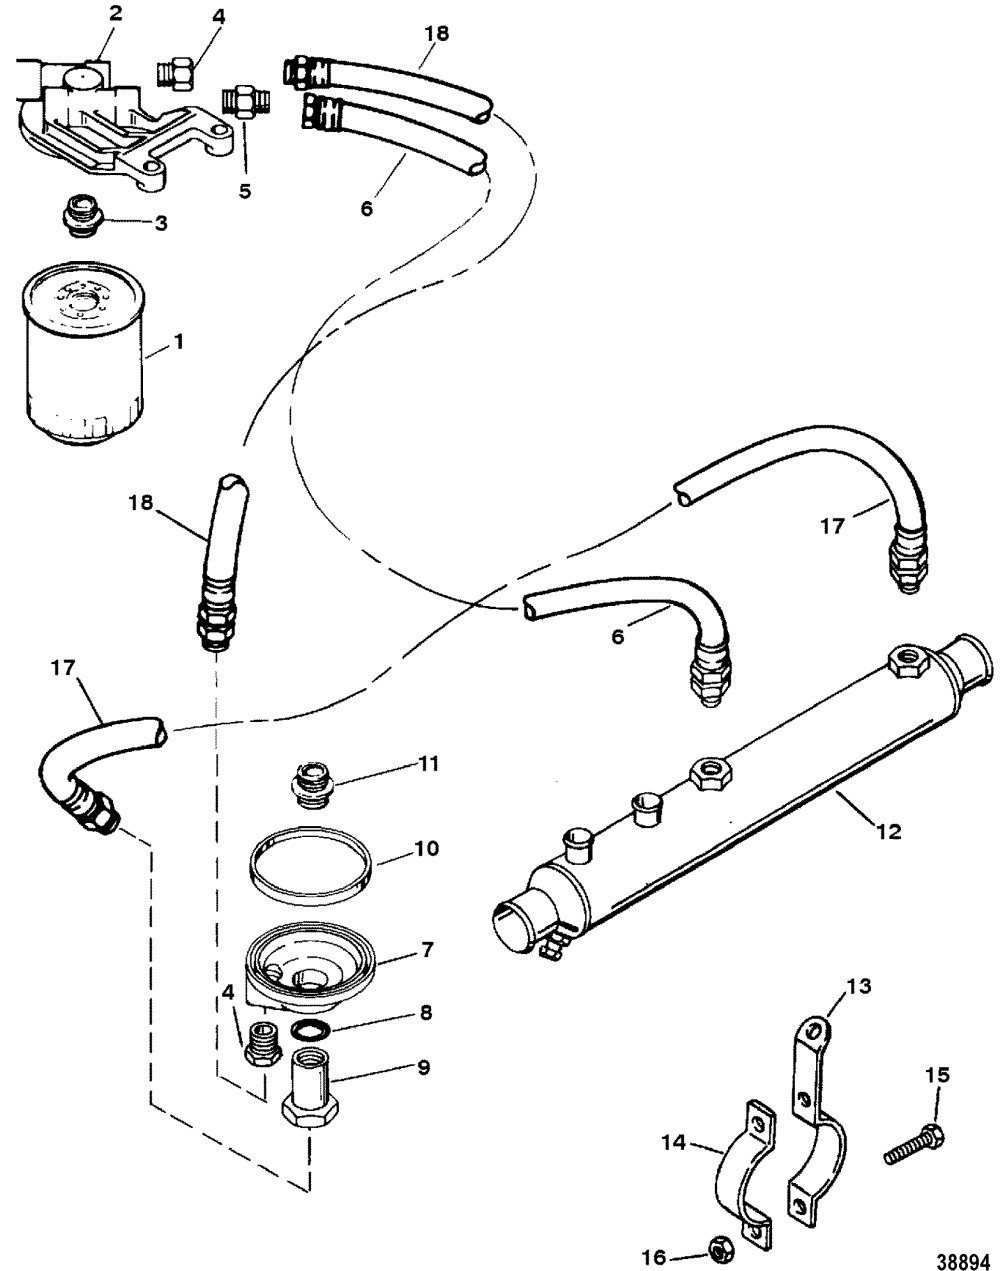 medium resolution of mercruiser 454 engine diagram bravo 3 schematics wiring diagrams u2022 rh parntesis co 7 4 mercruiser engine